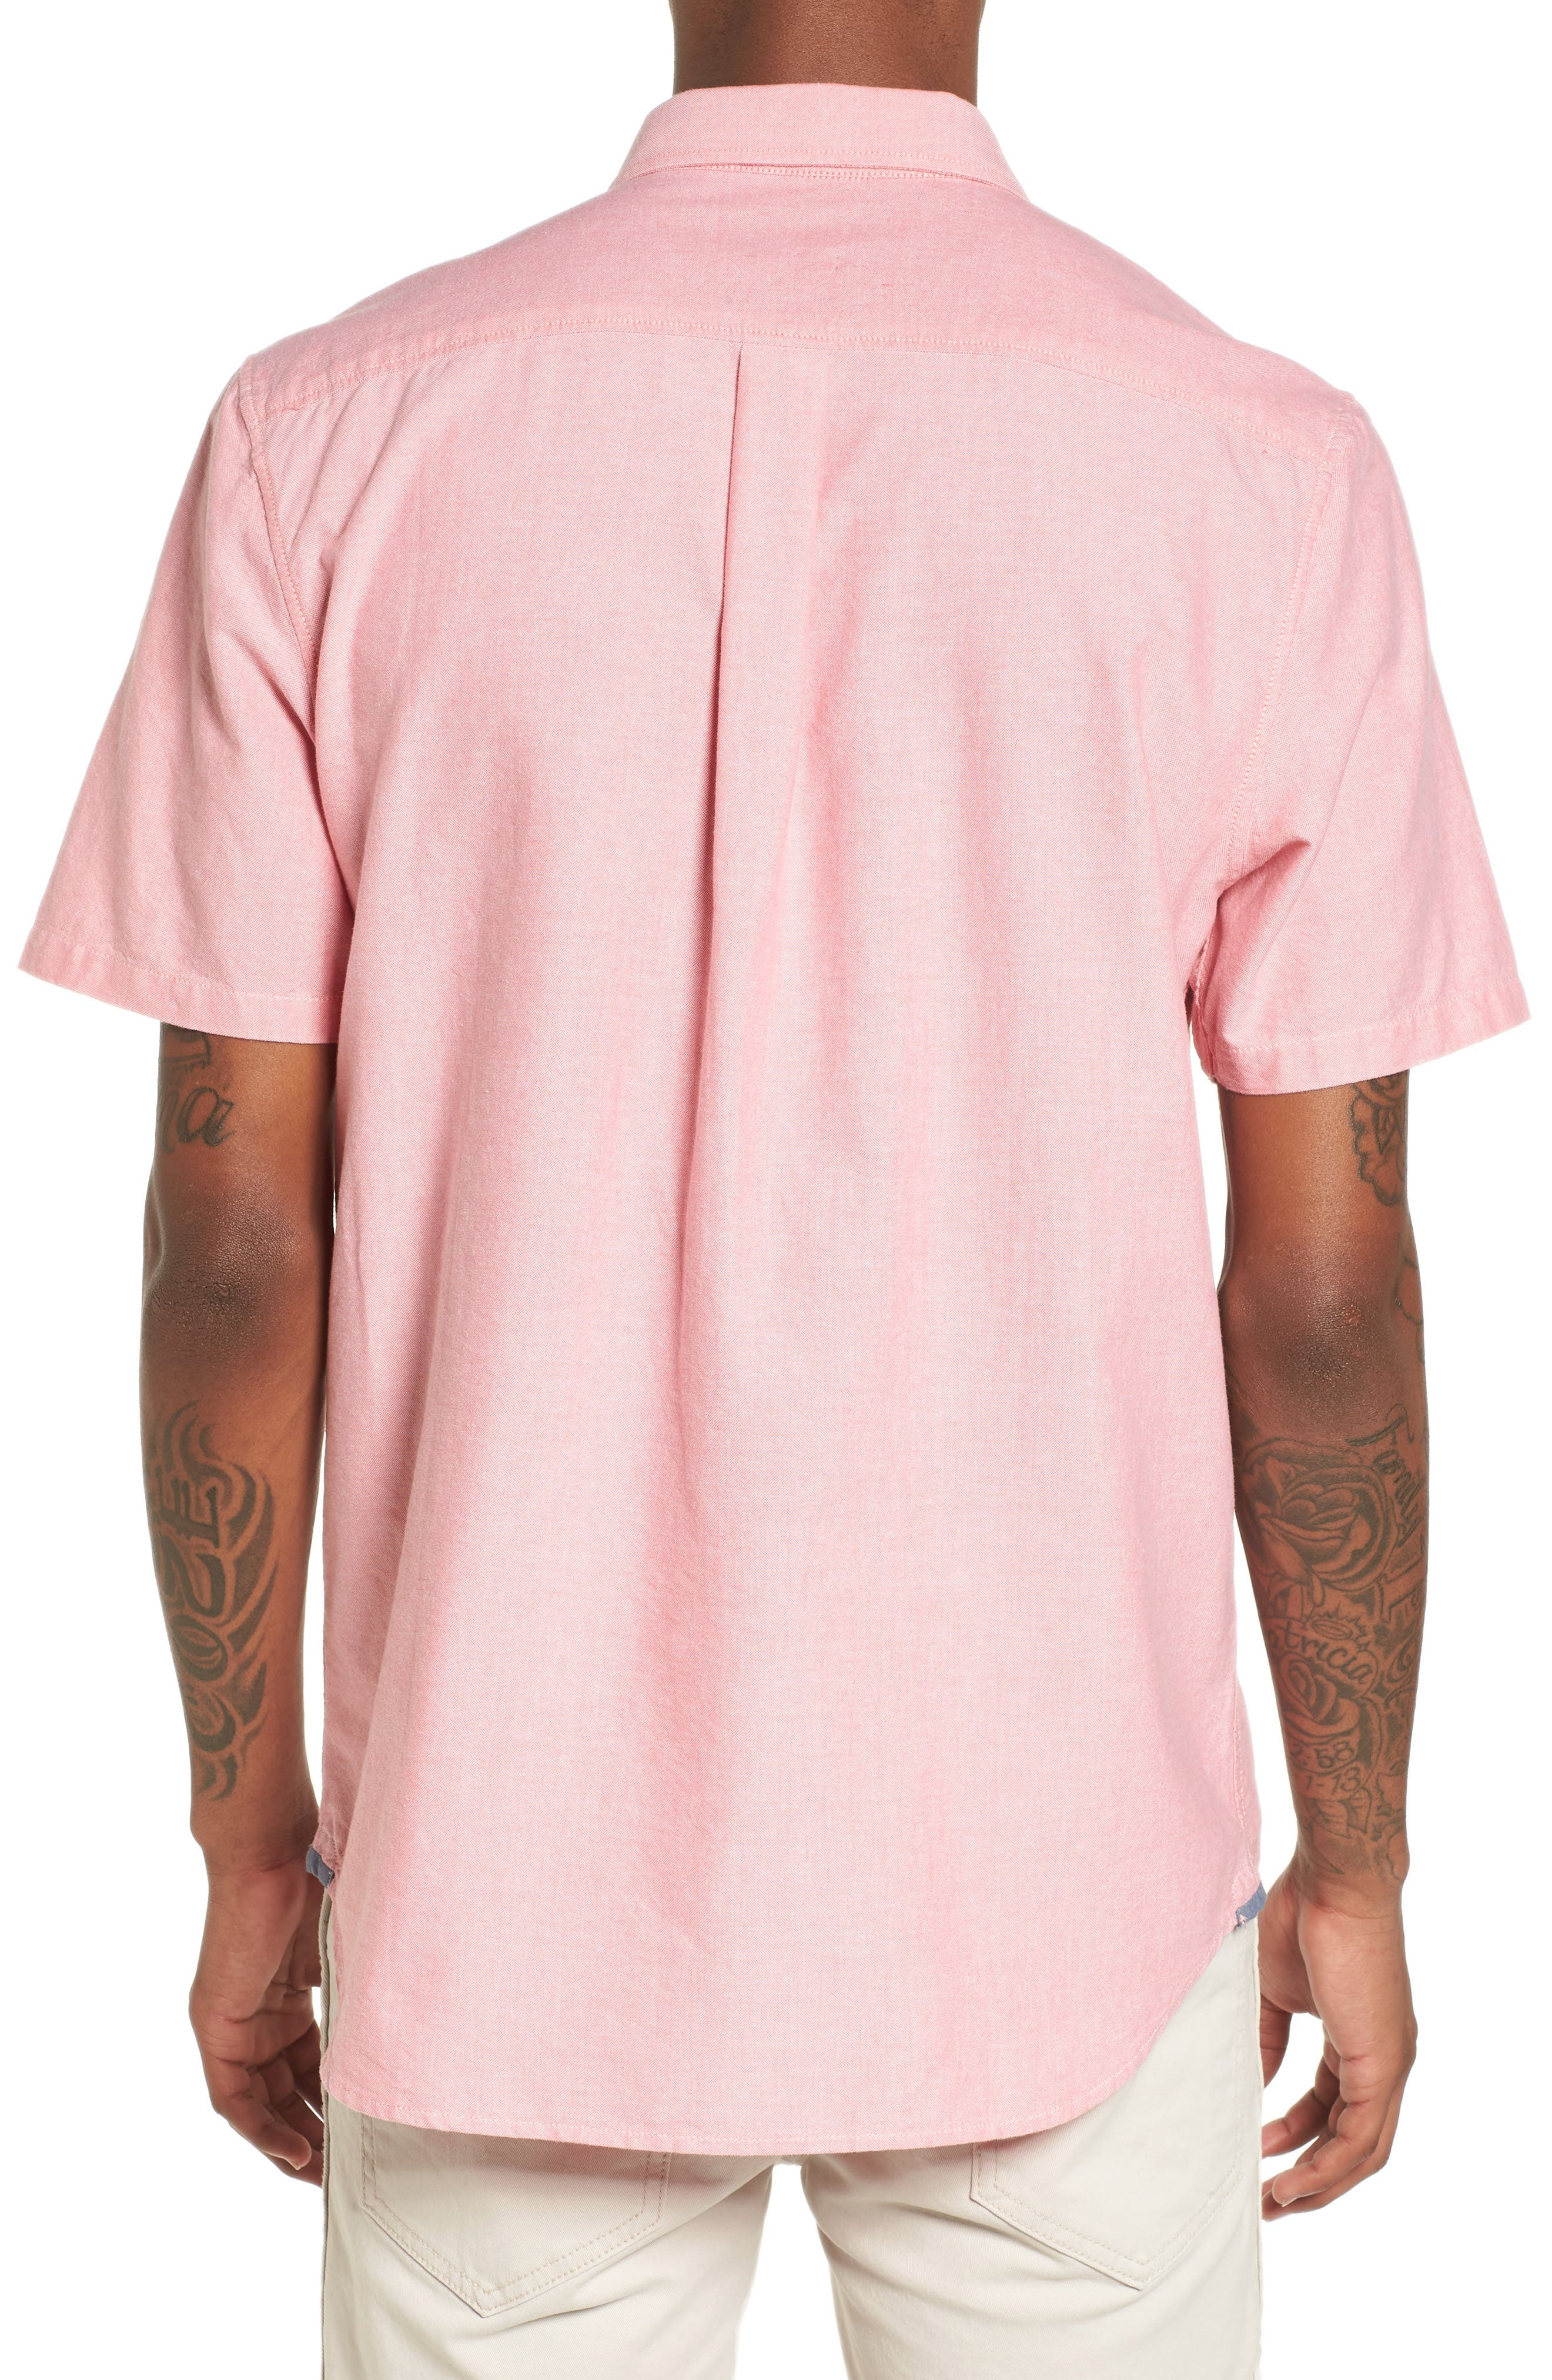 Houser Solid Woven Shirt,                             Alternate thumbnail 2, color,                             950